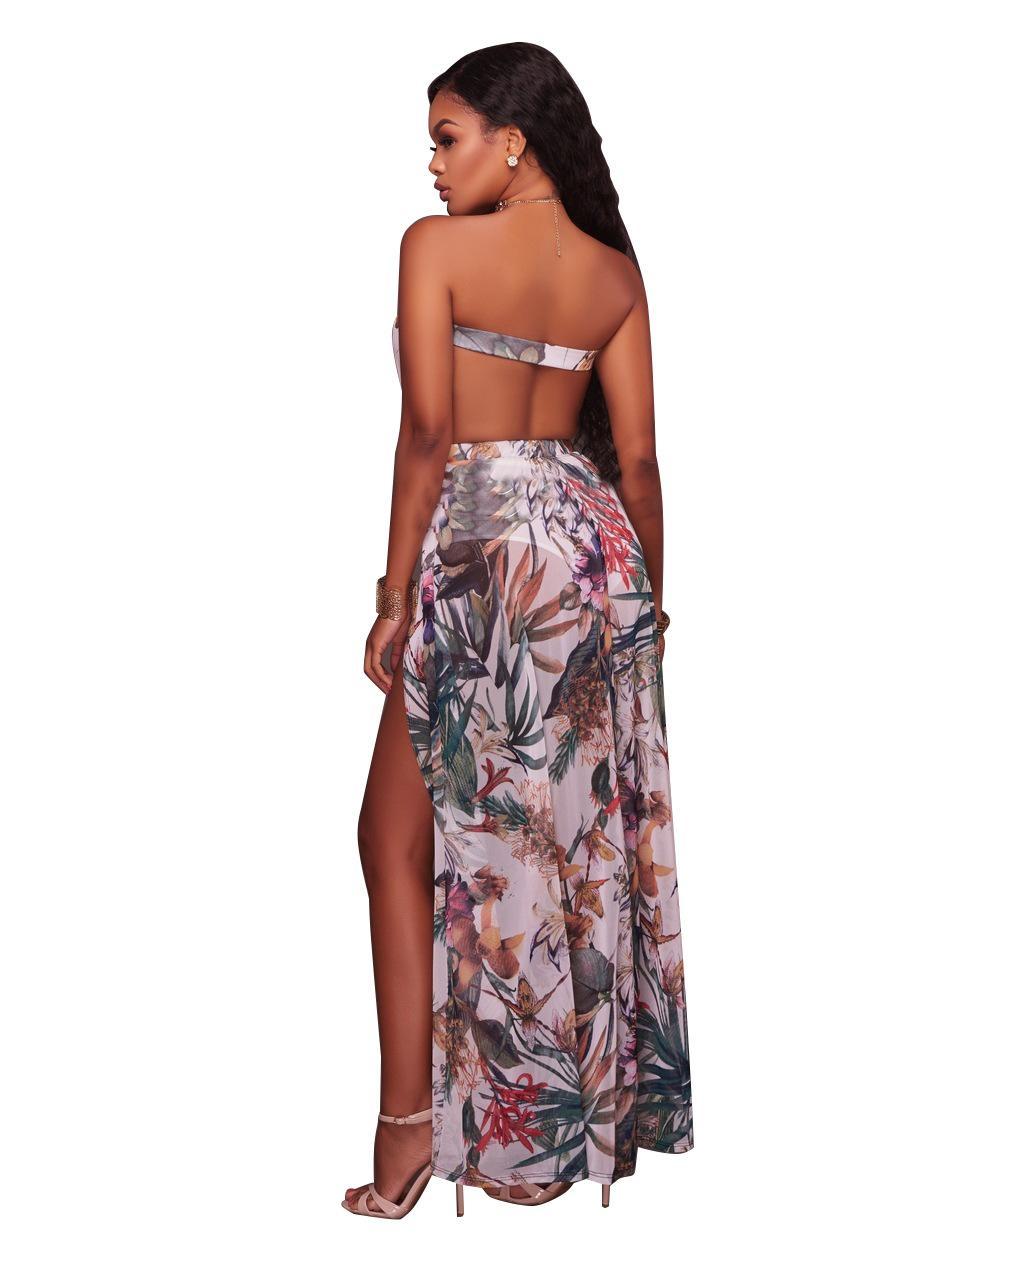 NOVA Design Especial de Moda Maxi Vestidos Longos Impresso Sexy Alta Fenda Strapless Casual Plus Size Roupas Femininas S-3XL